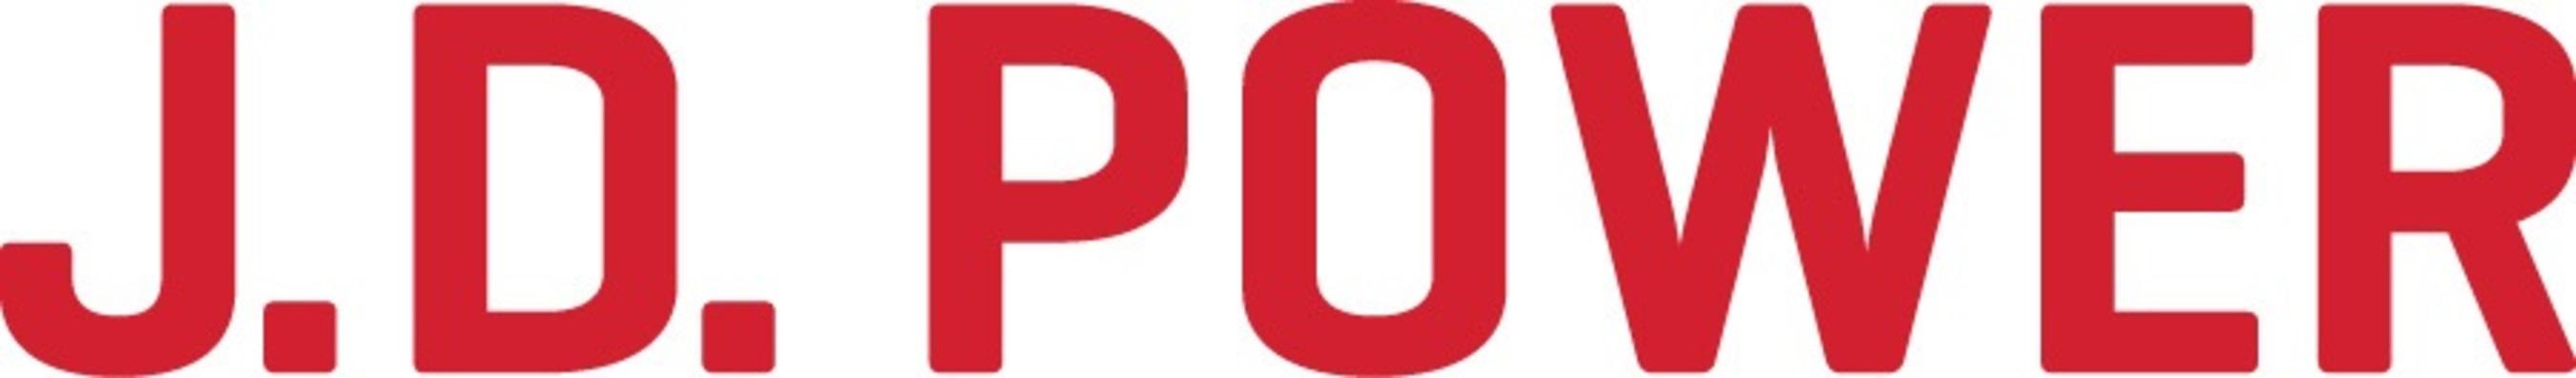 J.D. Power corporate logo.